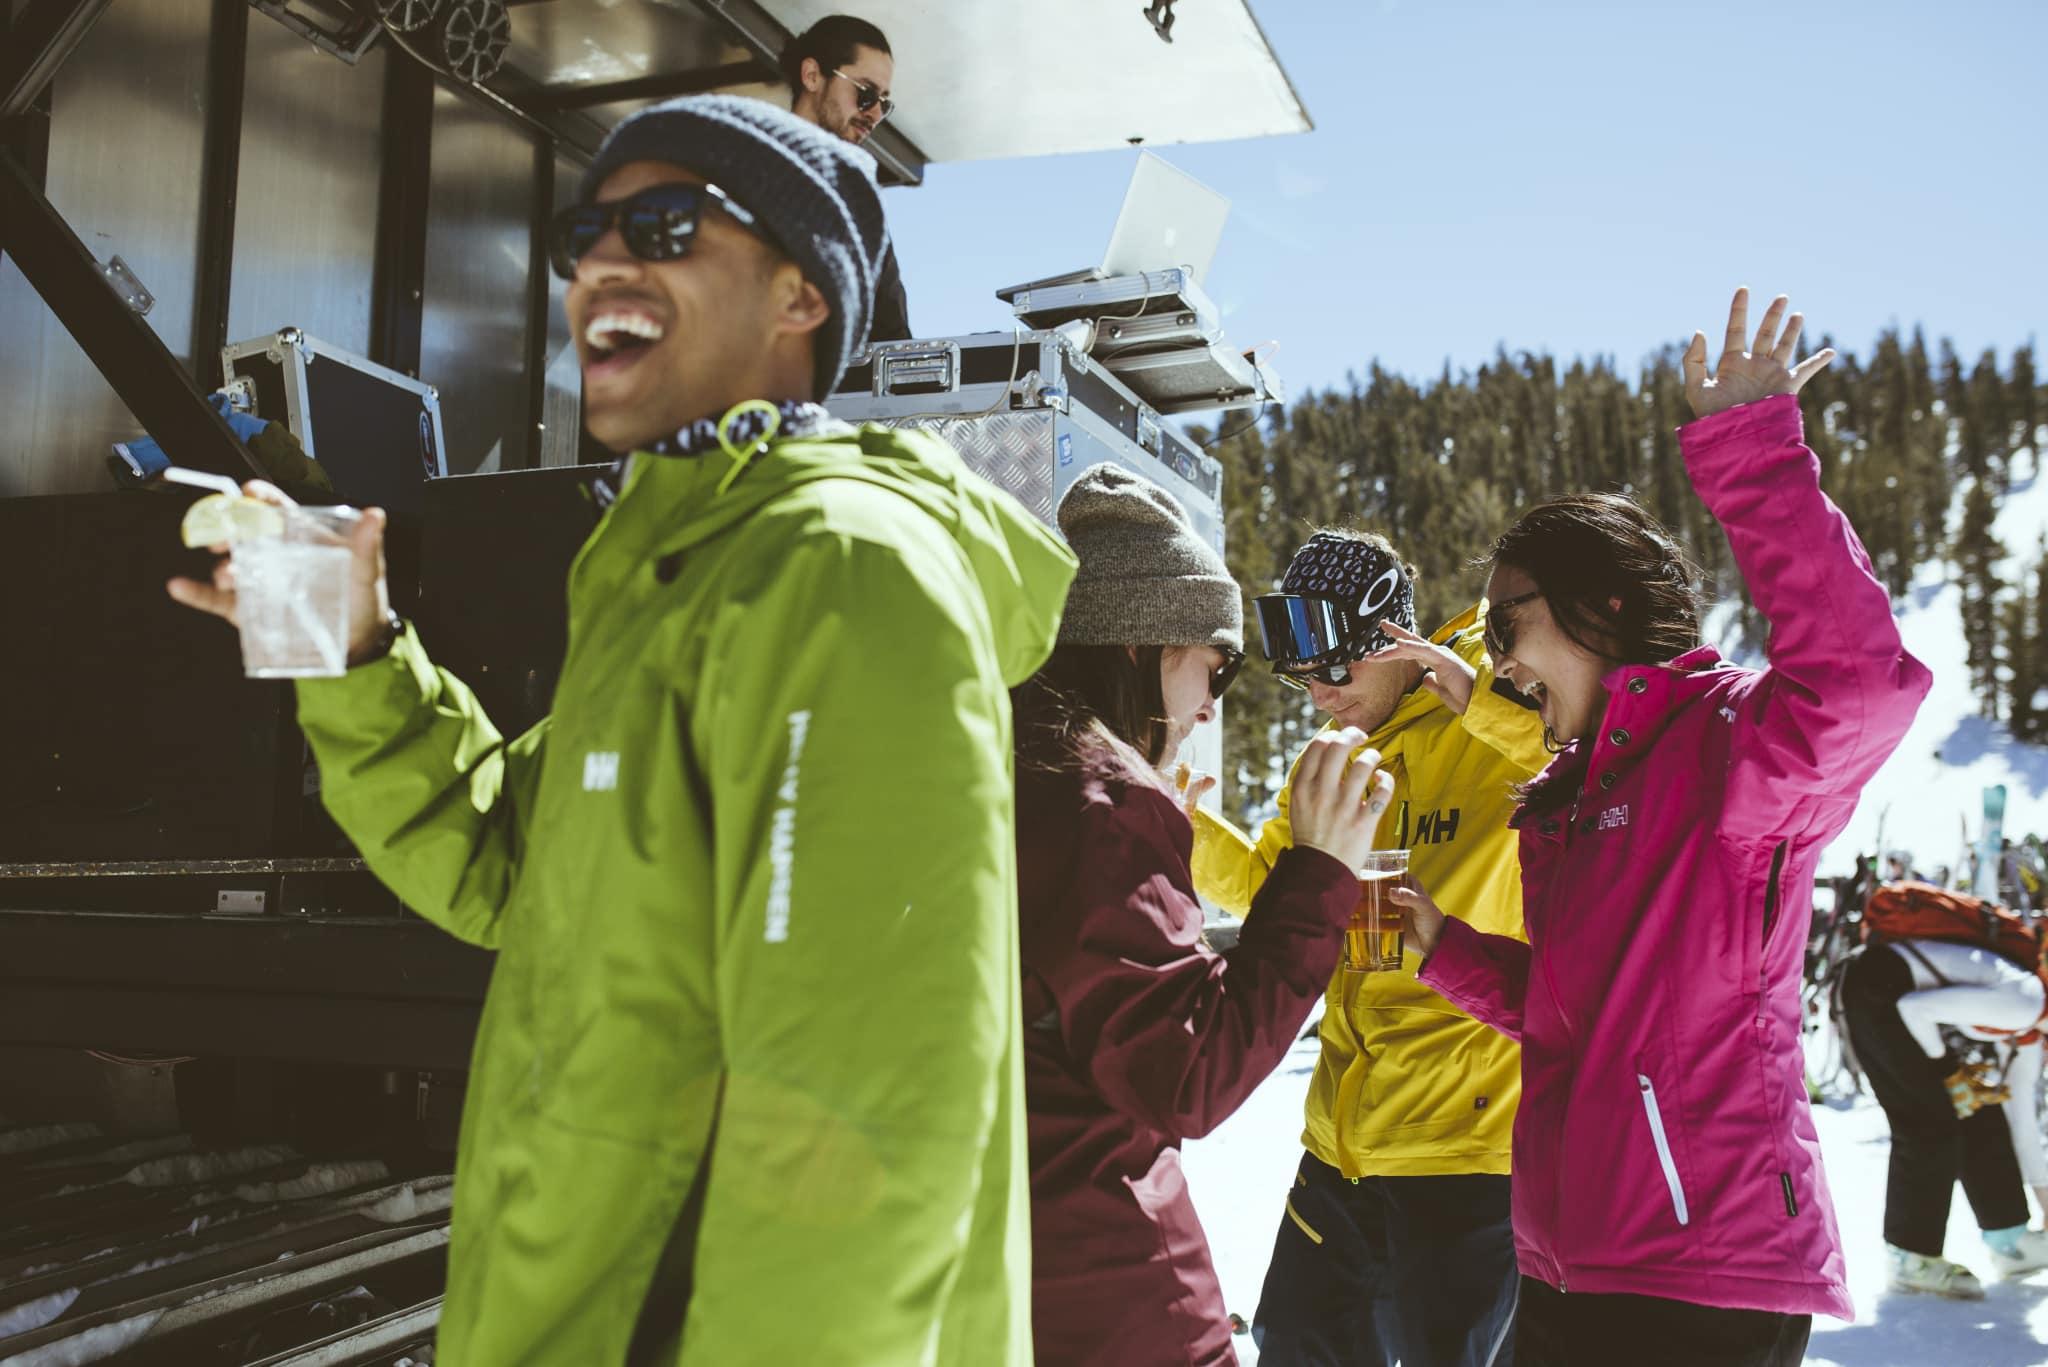 Altus Festival, Lake Tahoe's First Music, Mountain + Adventure Experience via @sacramentopress